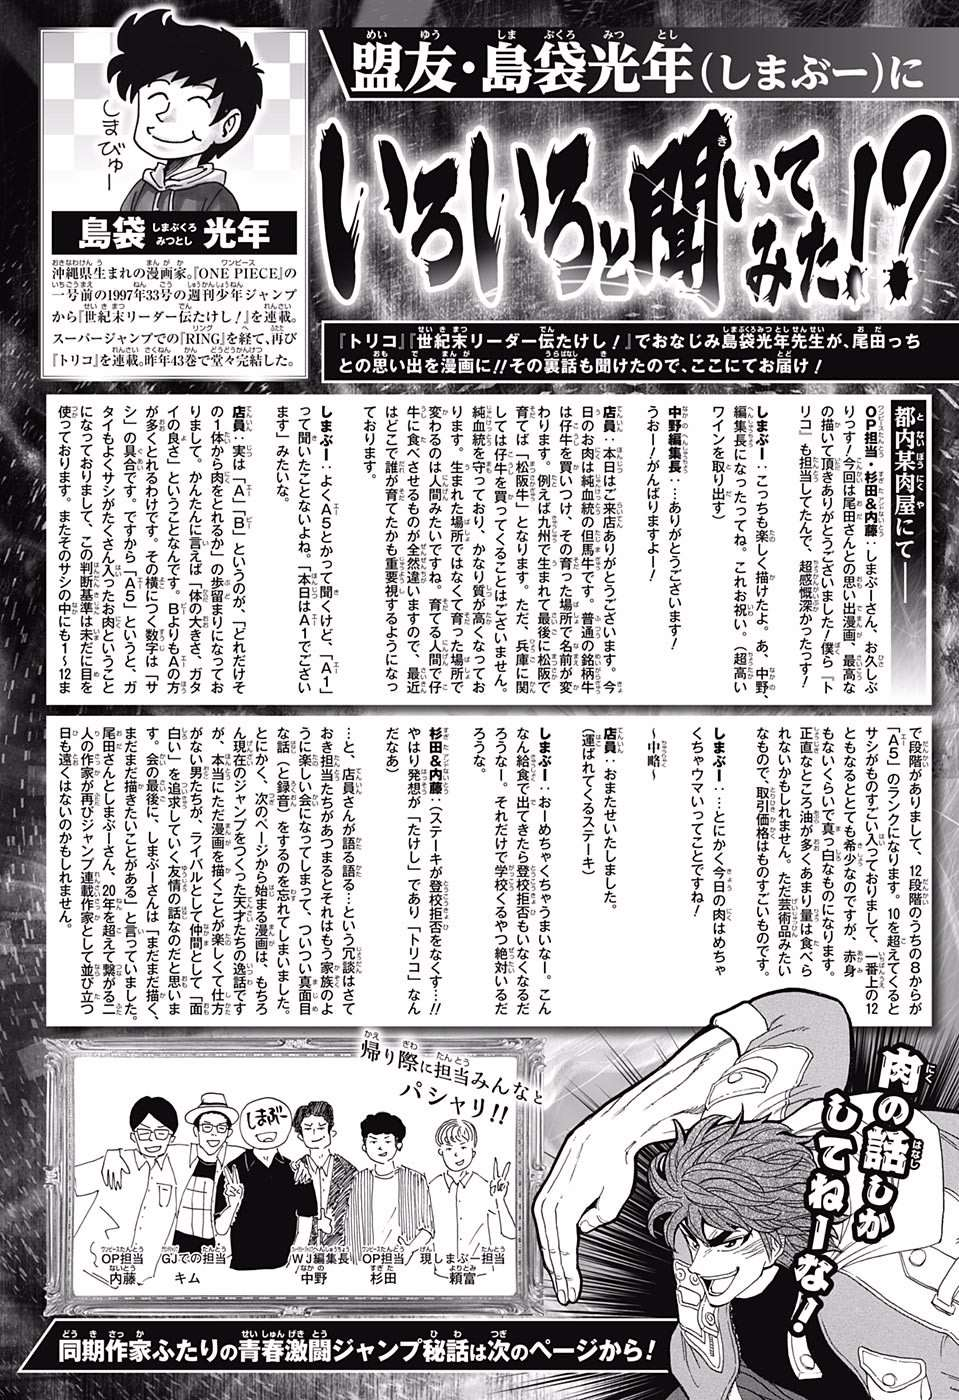 One Piece Manga 2017 F1DYkVb3